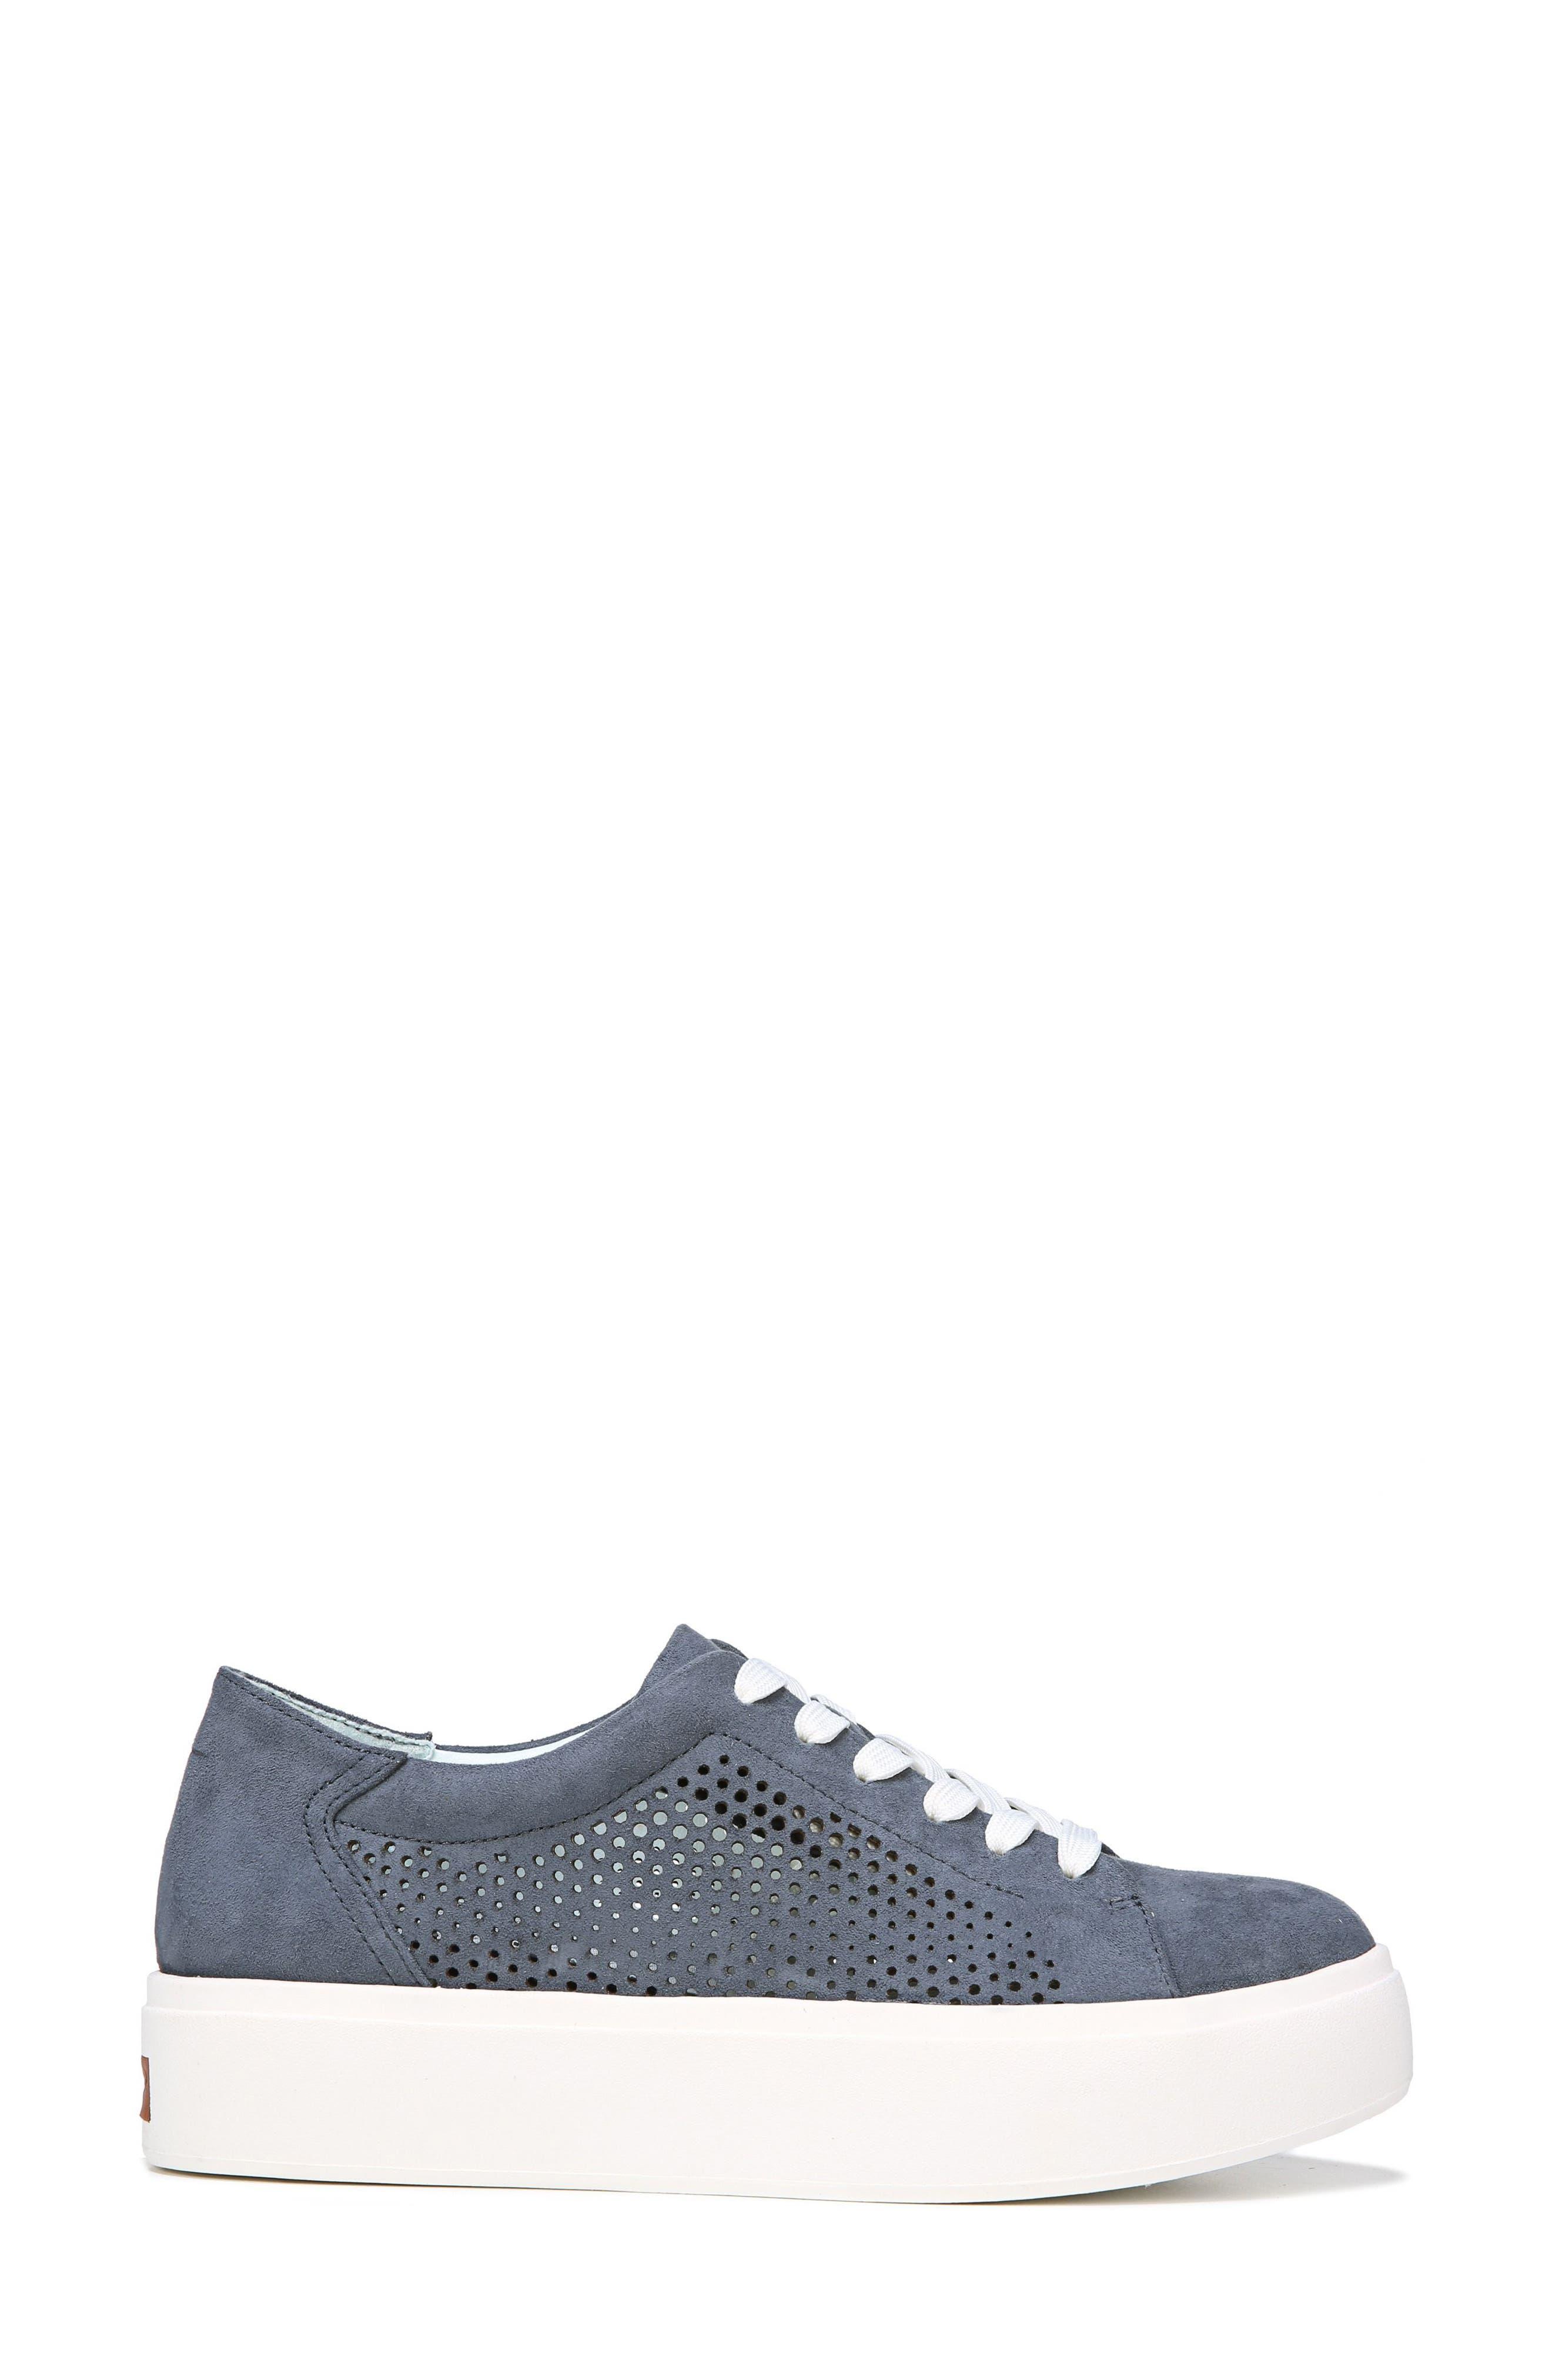 Alternate Image 3  - Dr. Scholl's Kinney Platform Sneaker (Women)